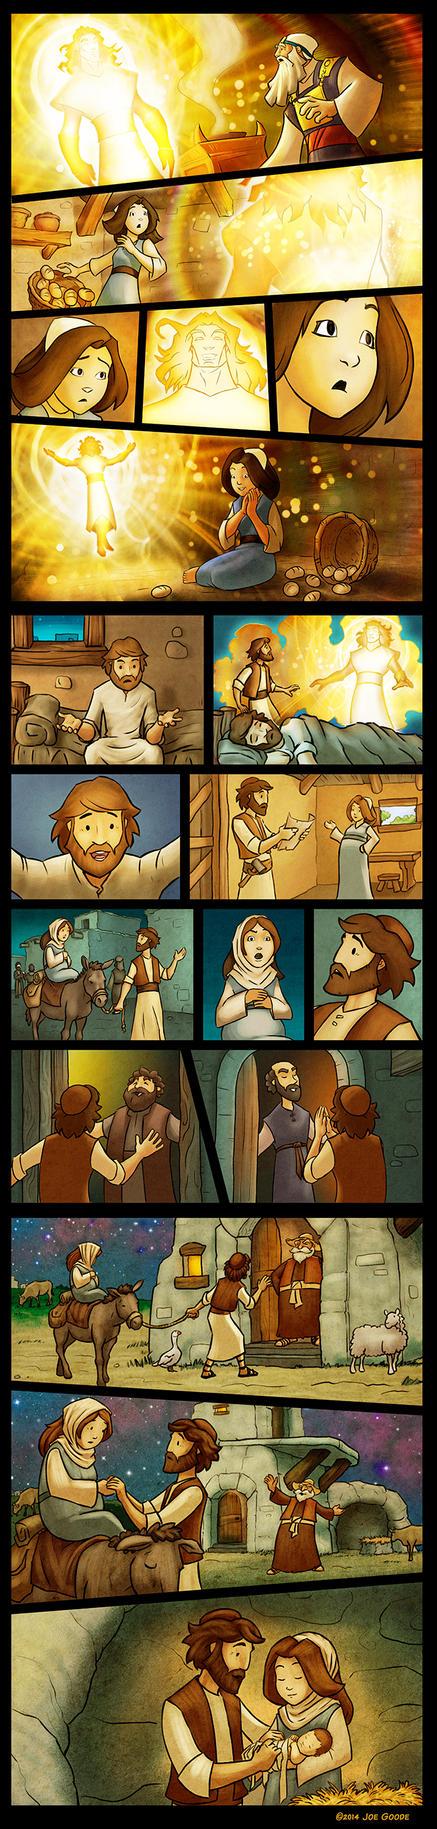 Mary and Joseph by eikonik